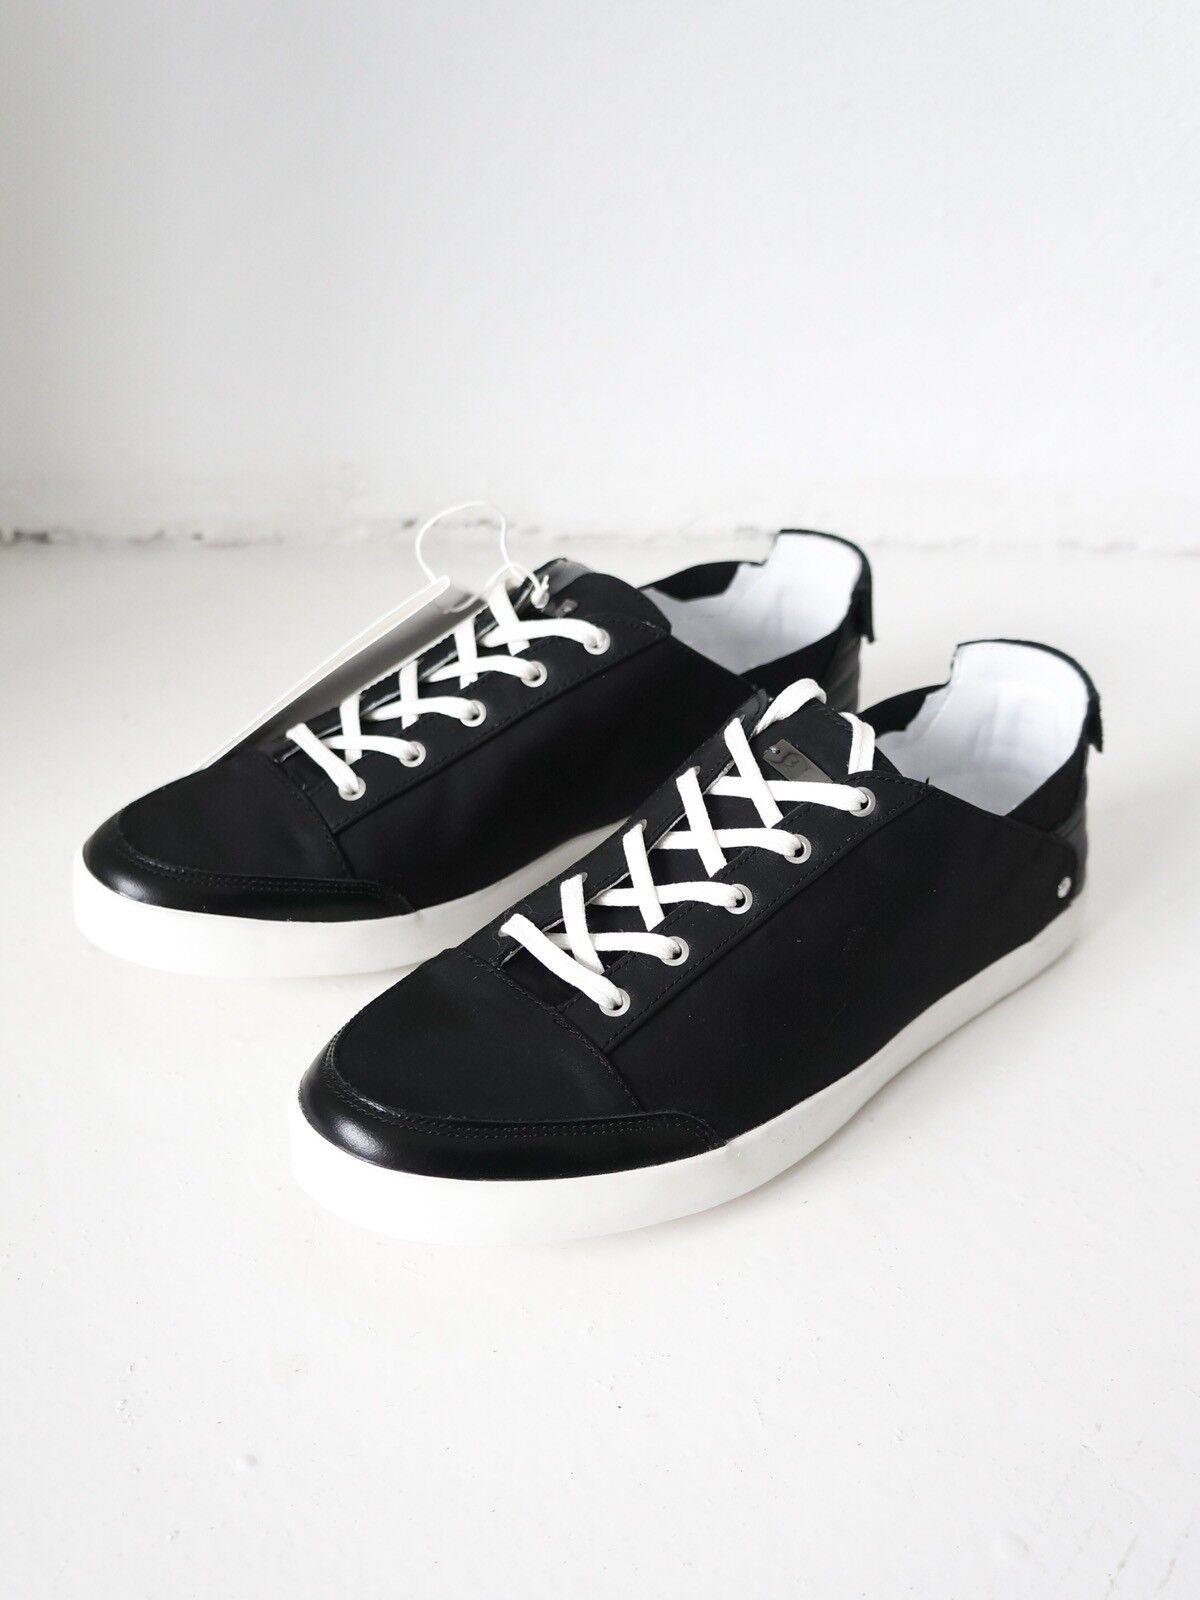 HOF115: / Adidas SLVR Turnschuhe schwarz / HOF115: Plim low Turnschuhe schuhe schwarz 40 2/3 67050f